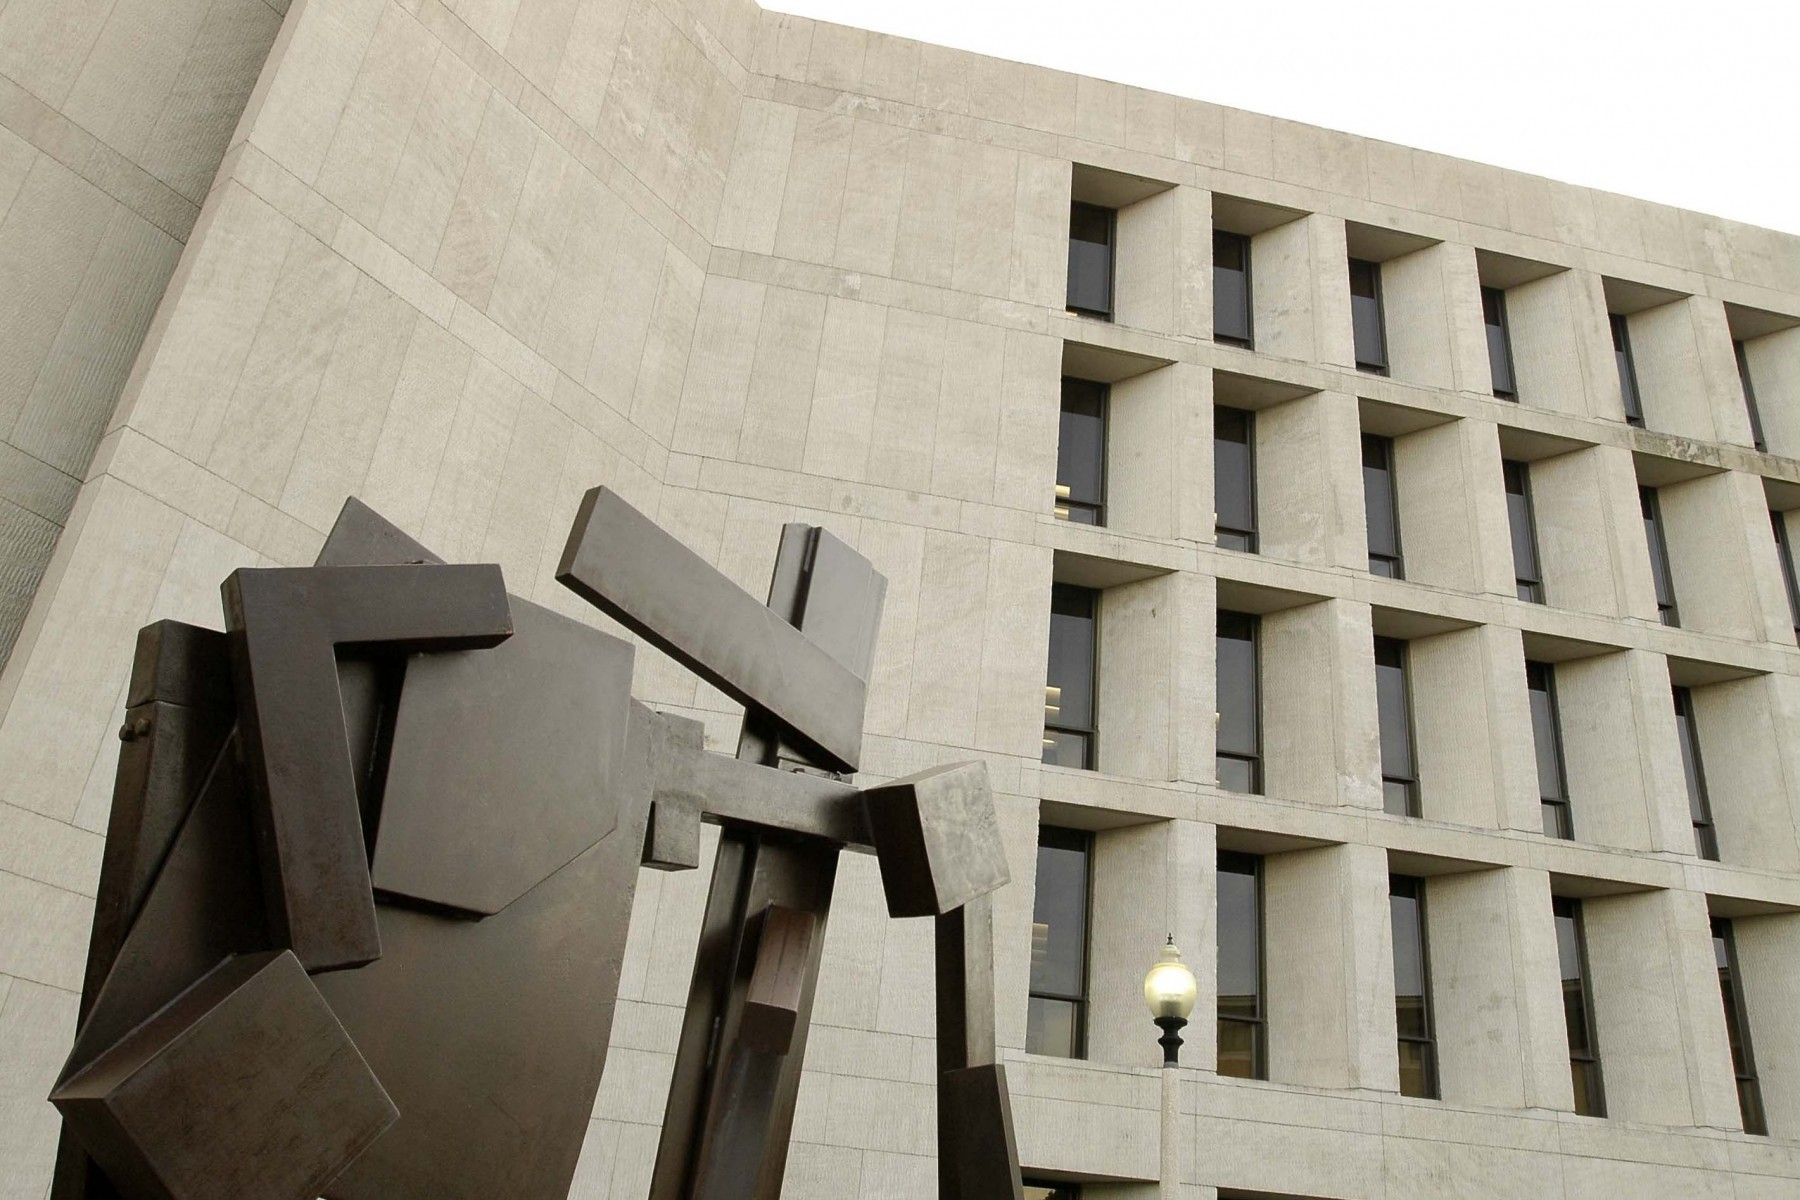 metal sculpture up against building